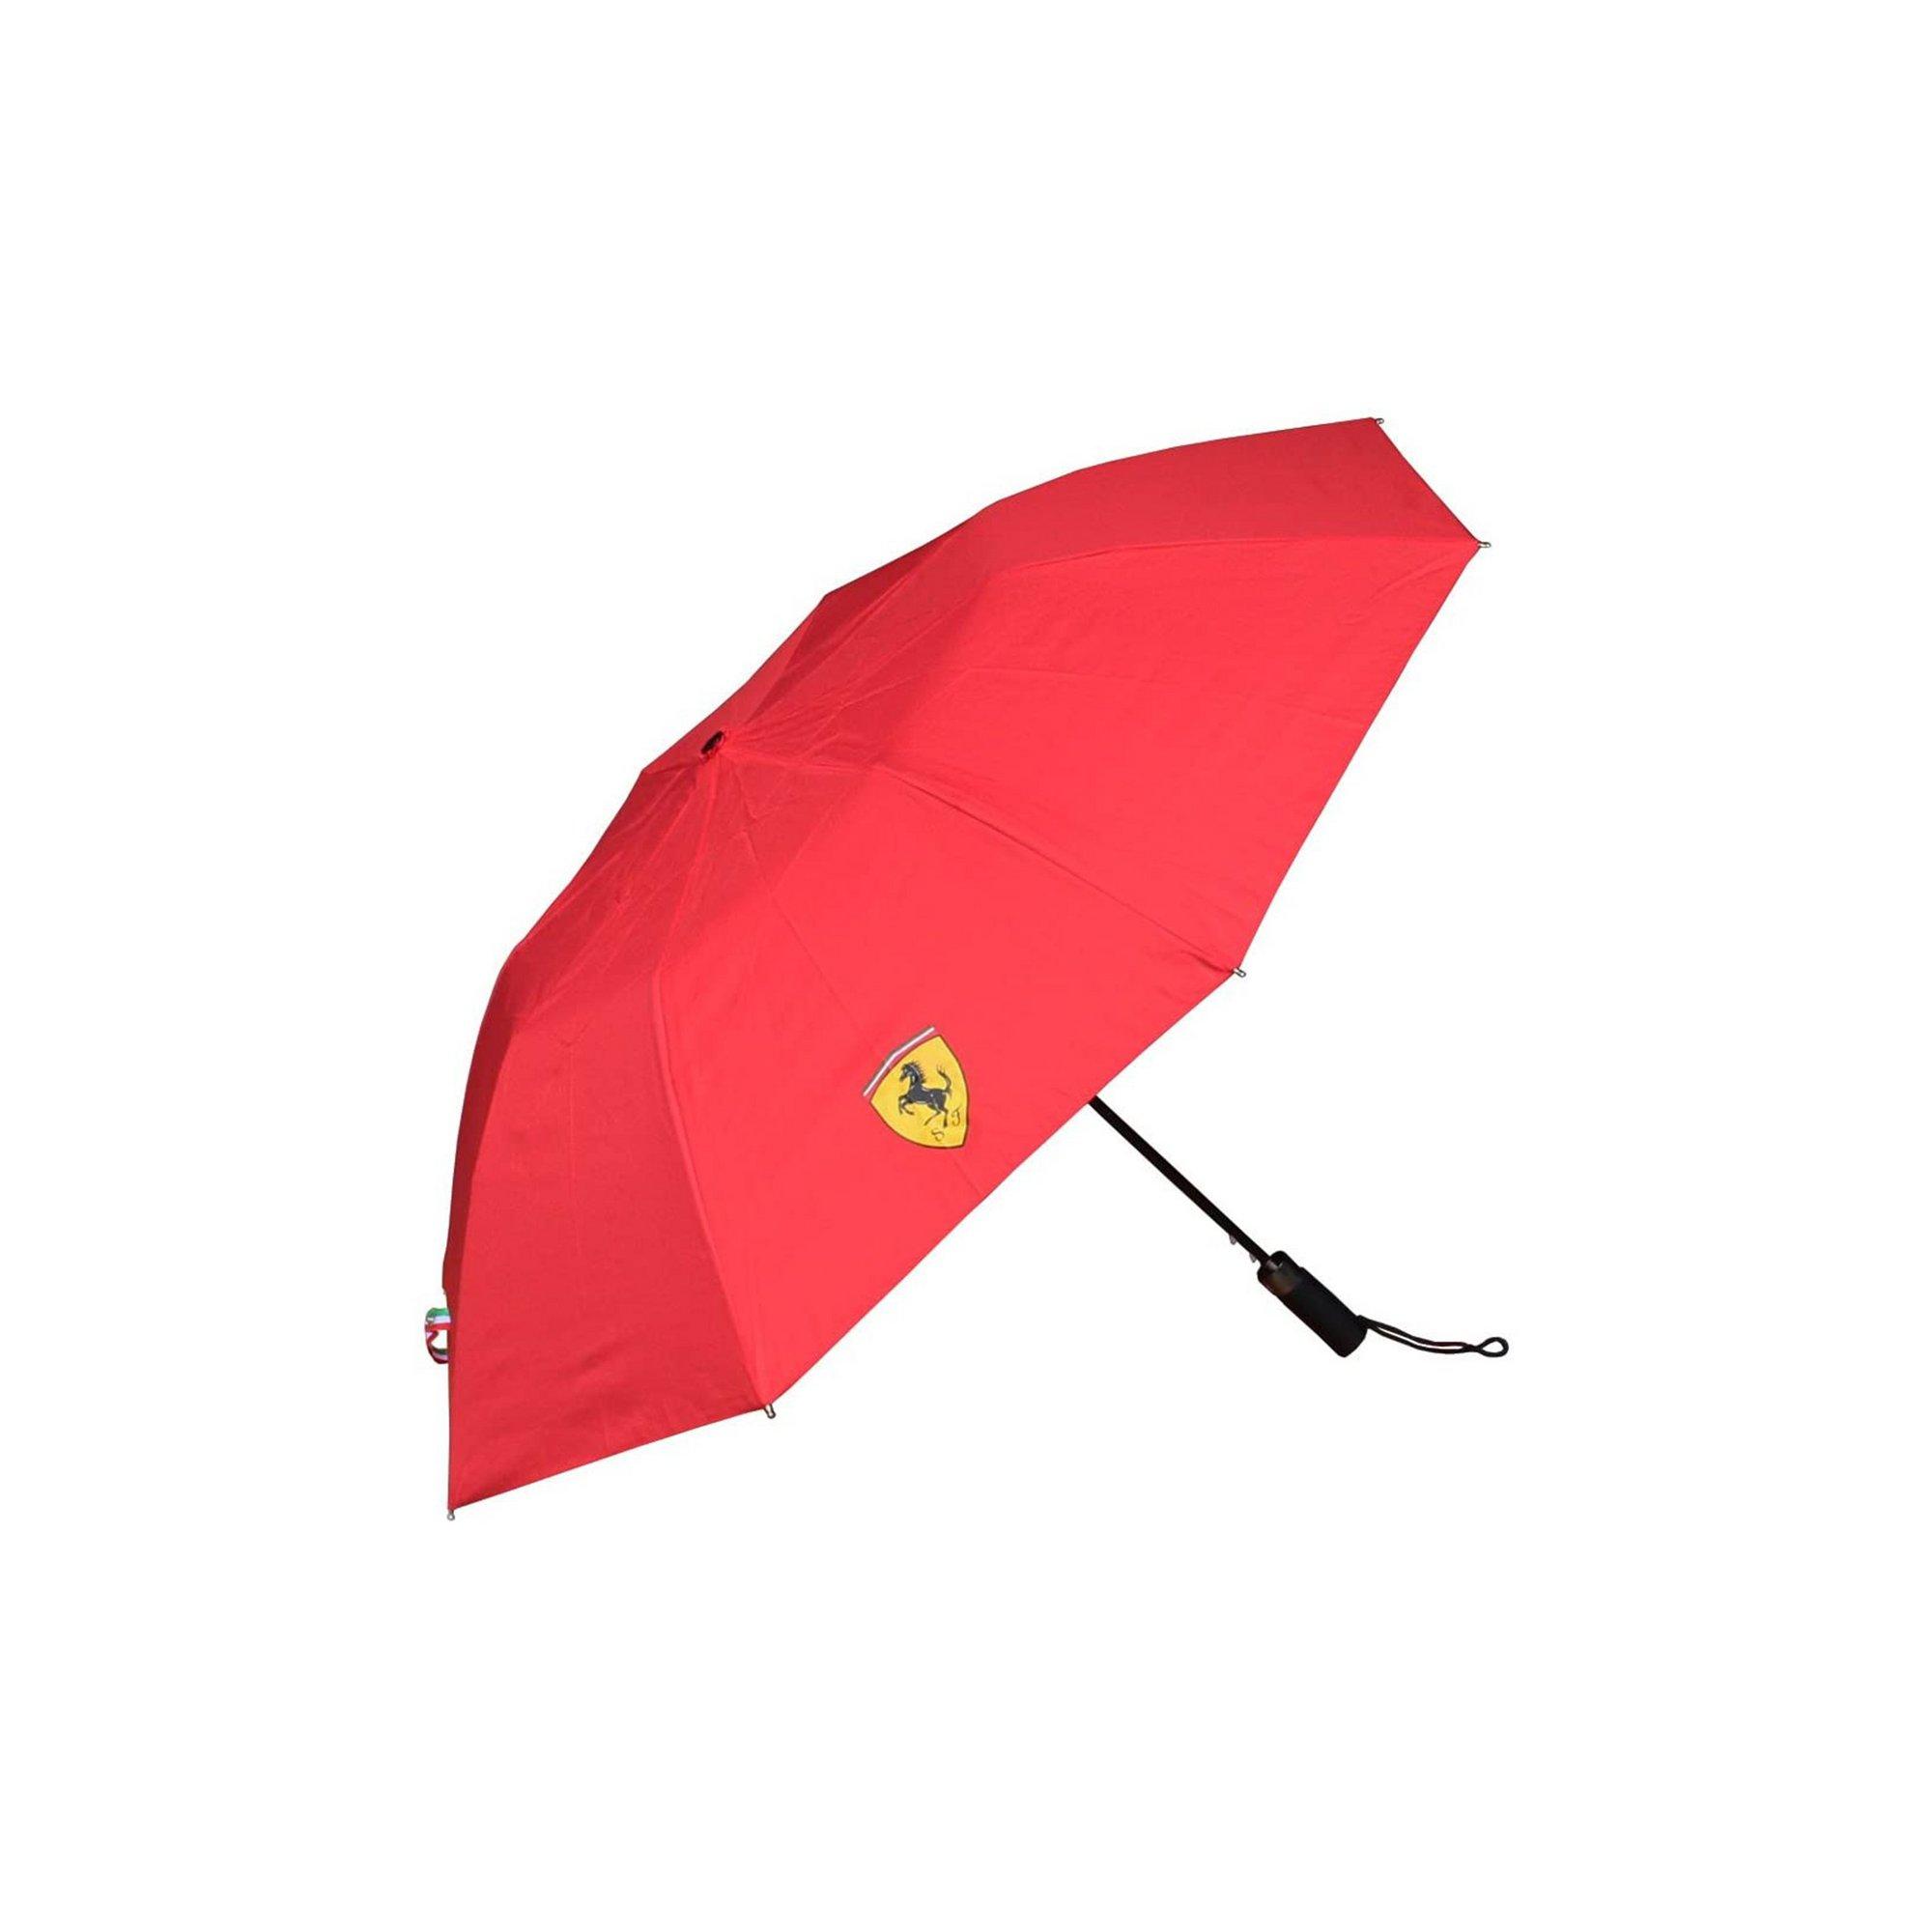 Image of Ferrari F1 Compact Red Umbrella